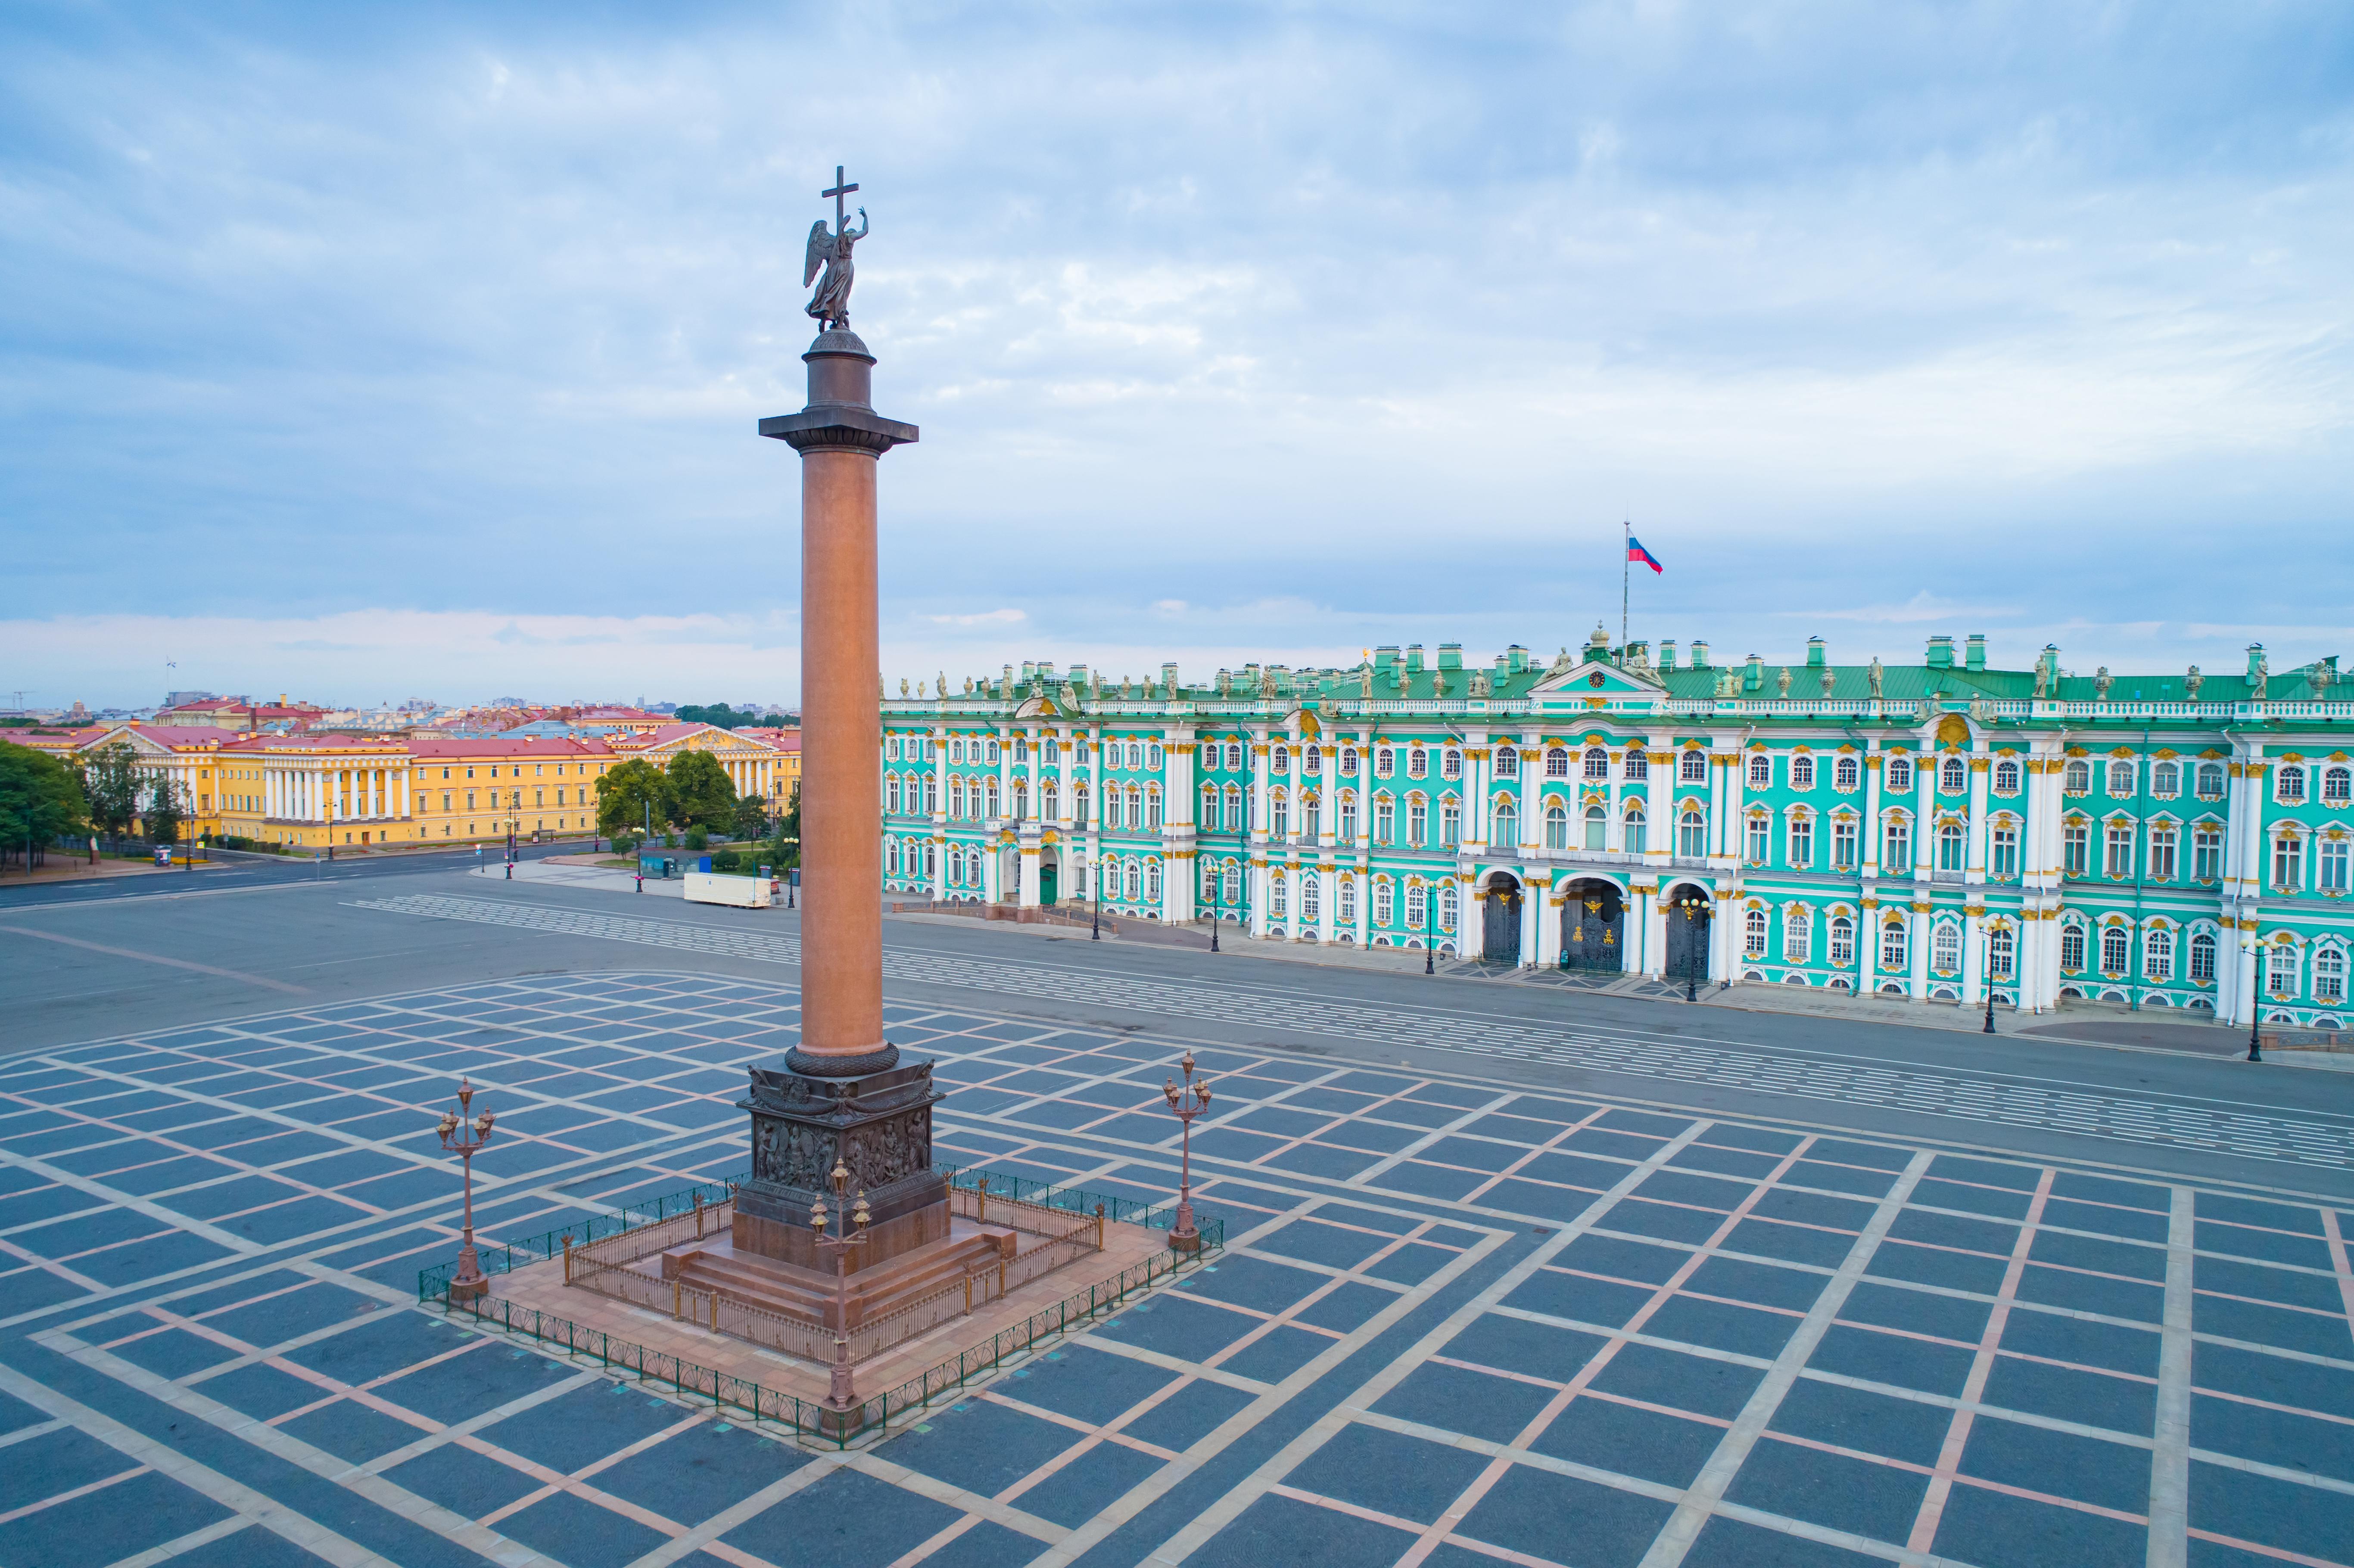 Palace Square with State Hermitage Museum views